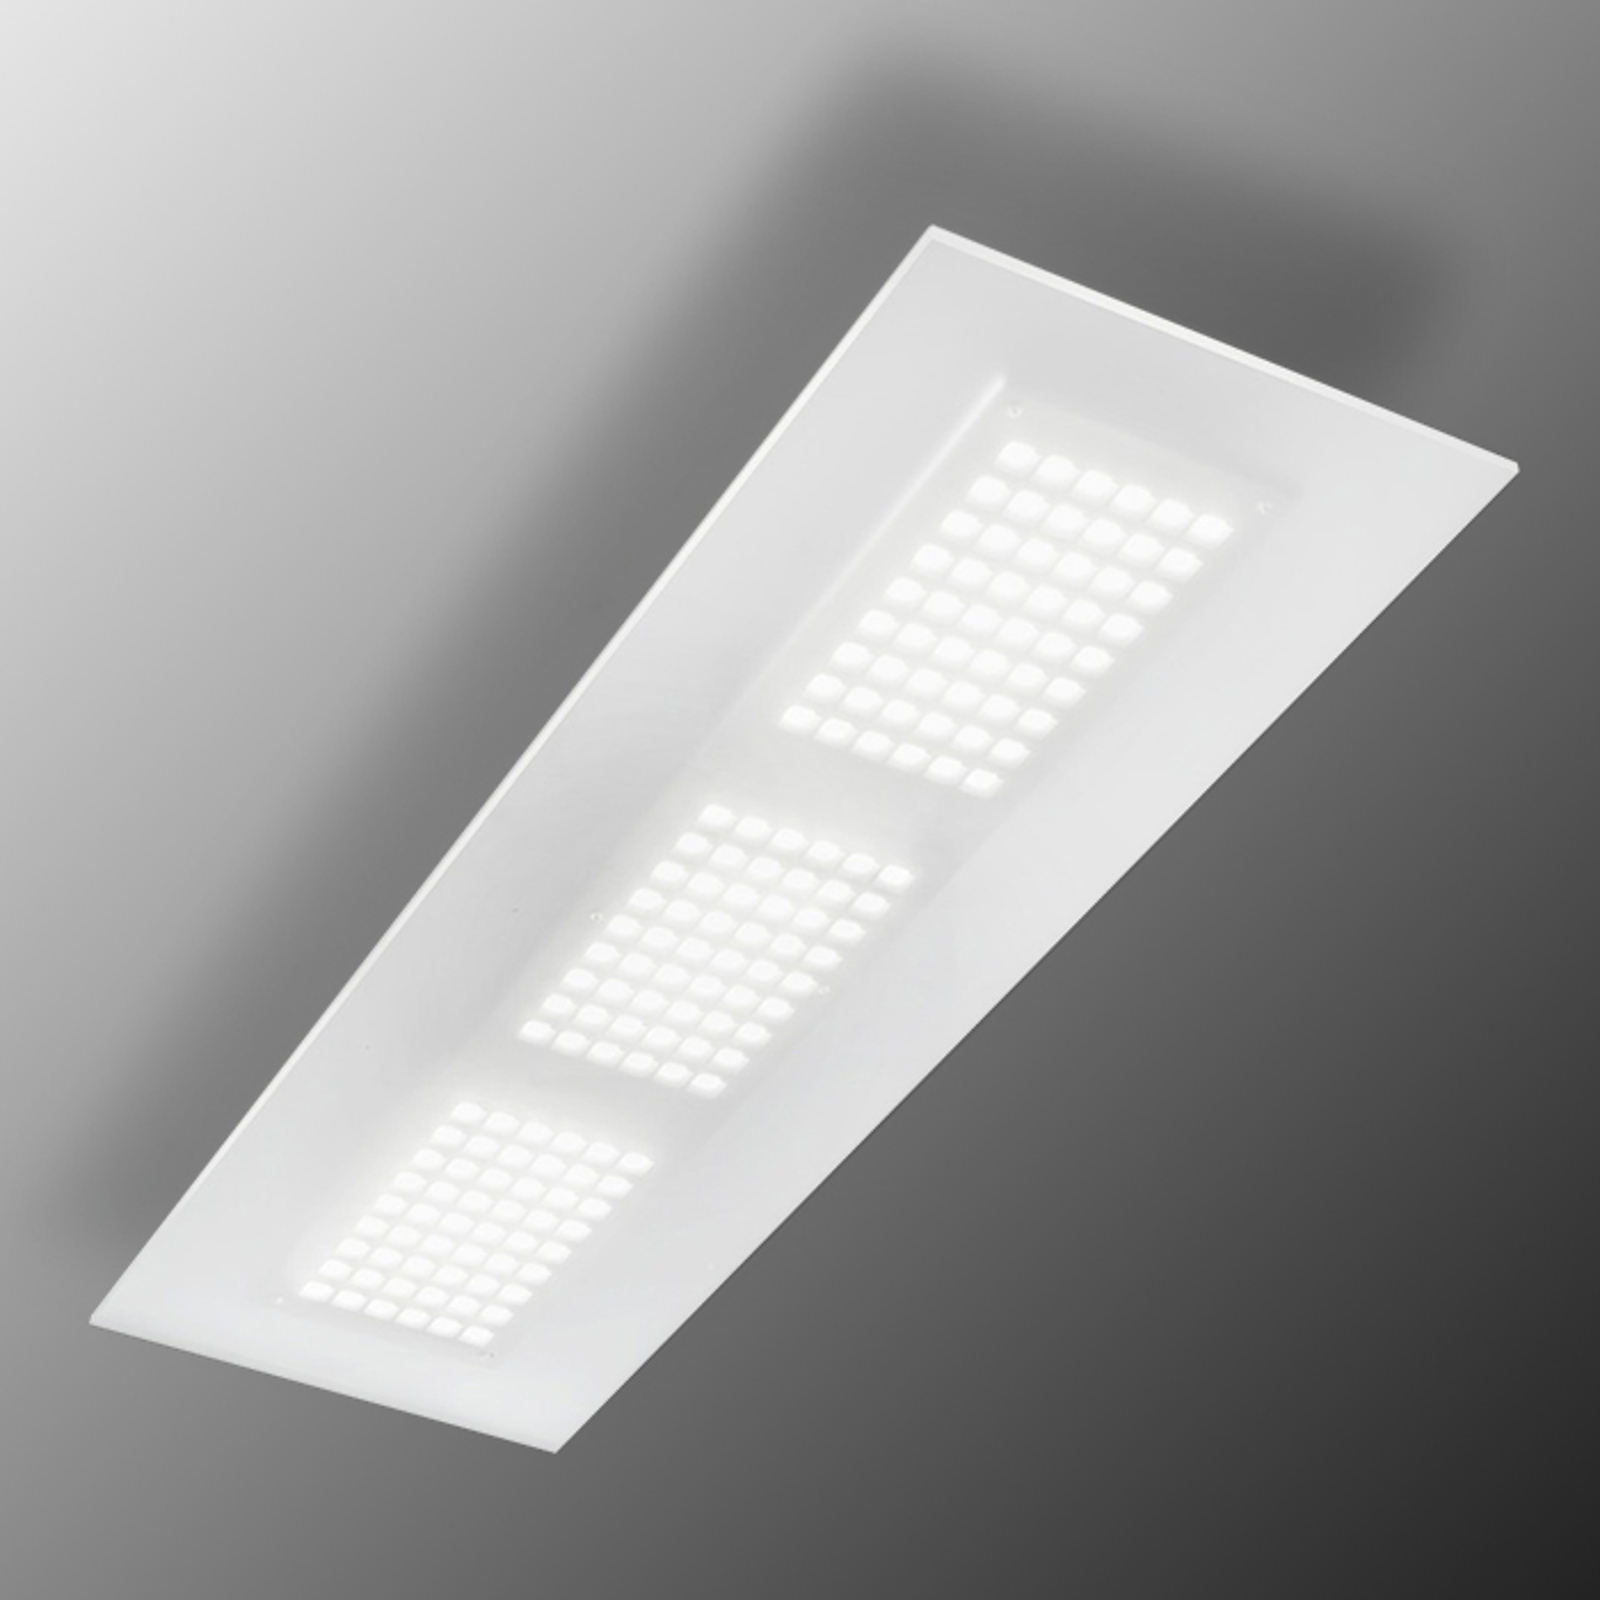 Krachtige LED plafondlamp Dublight